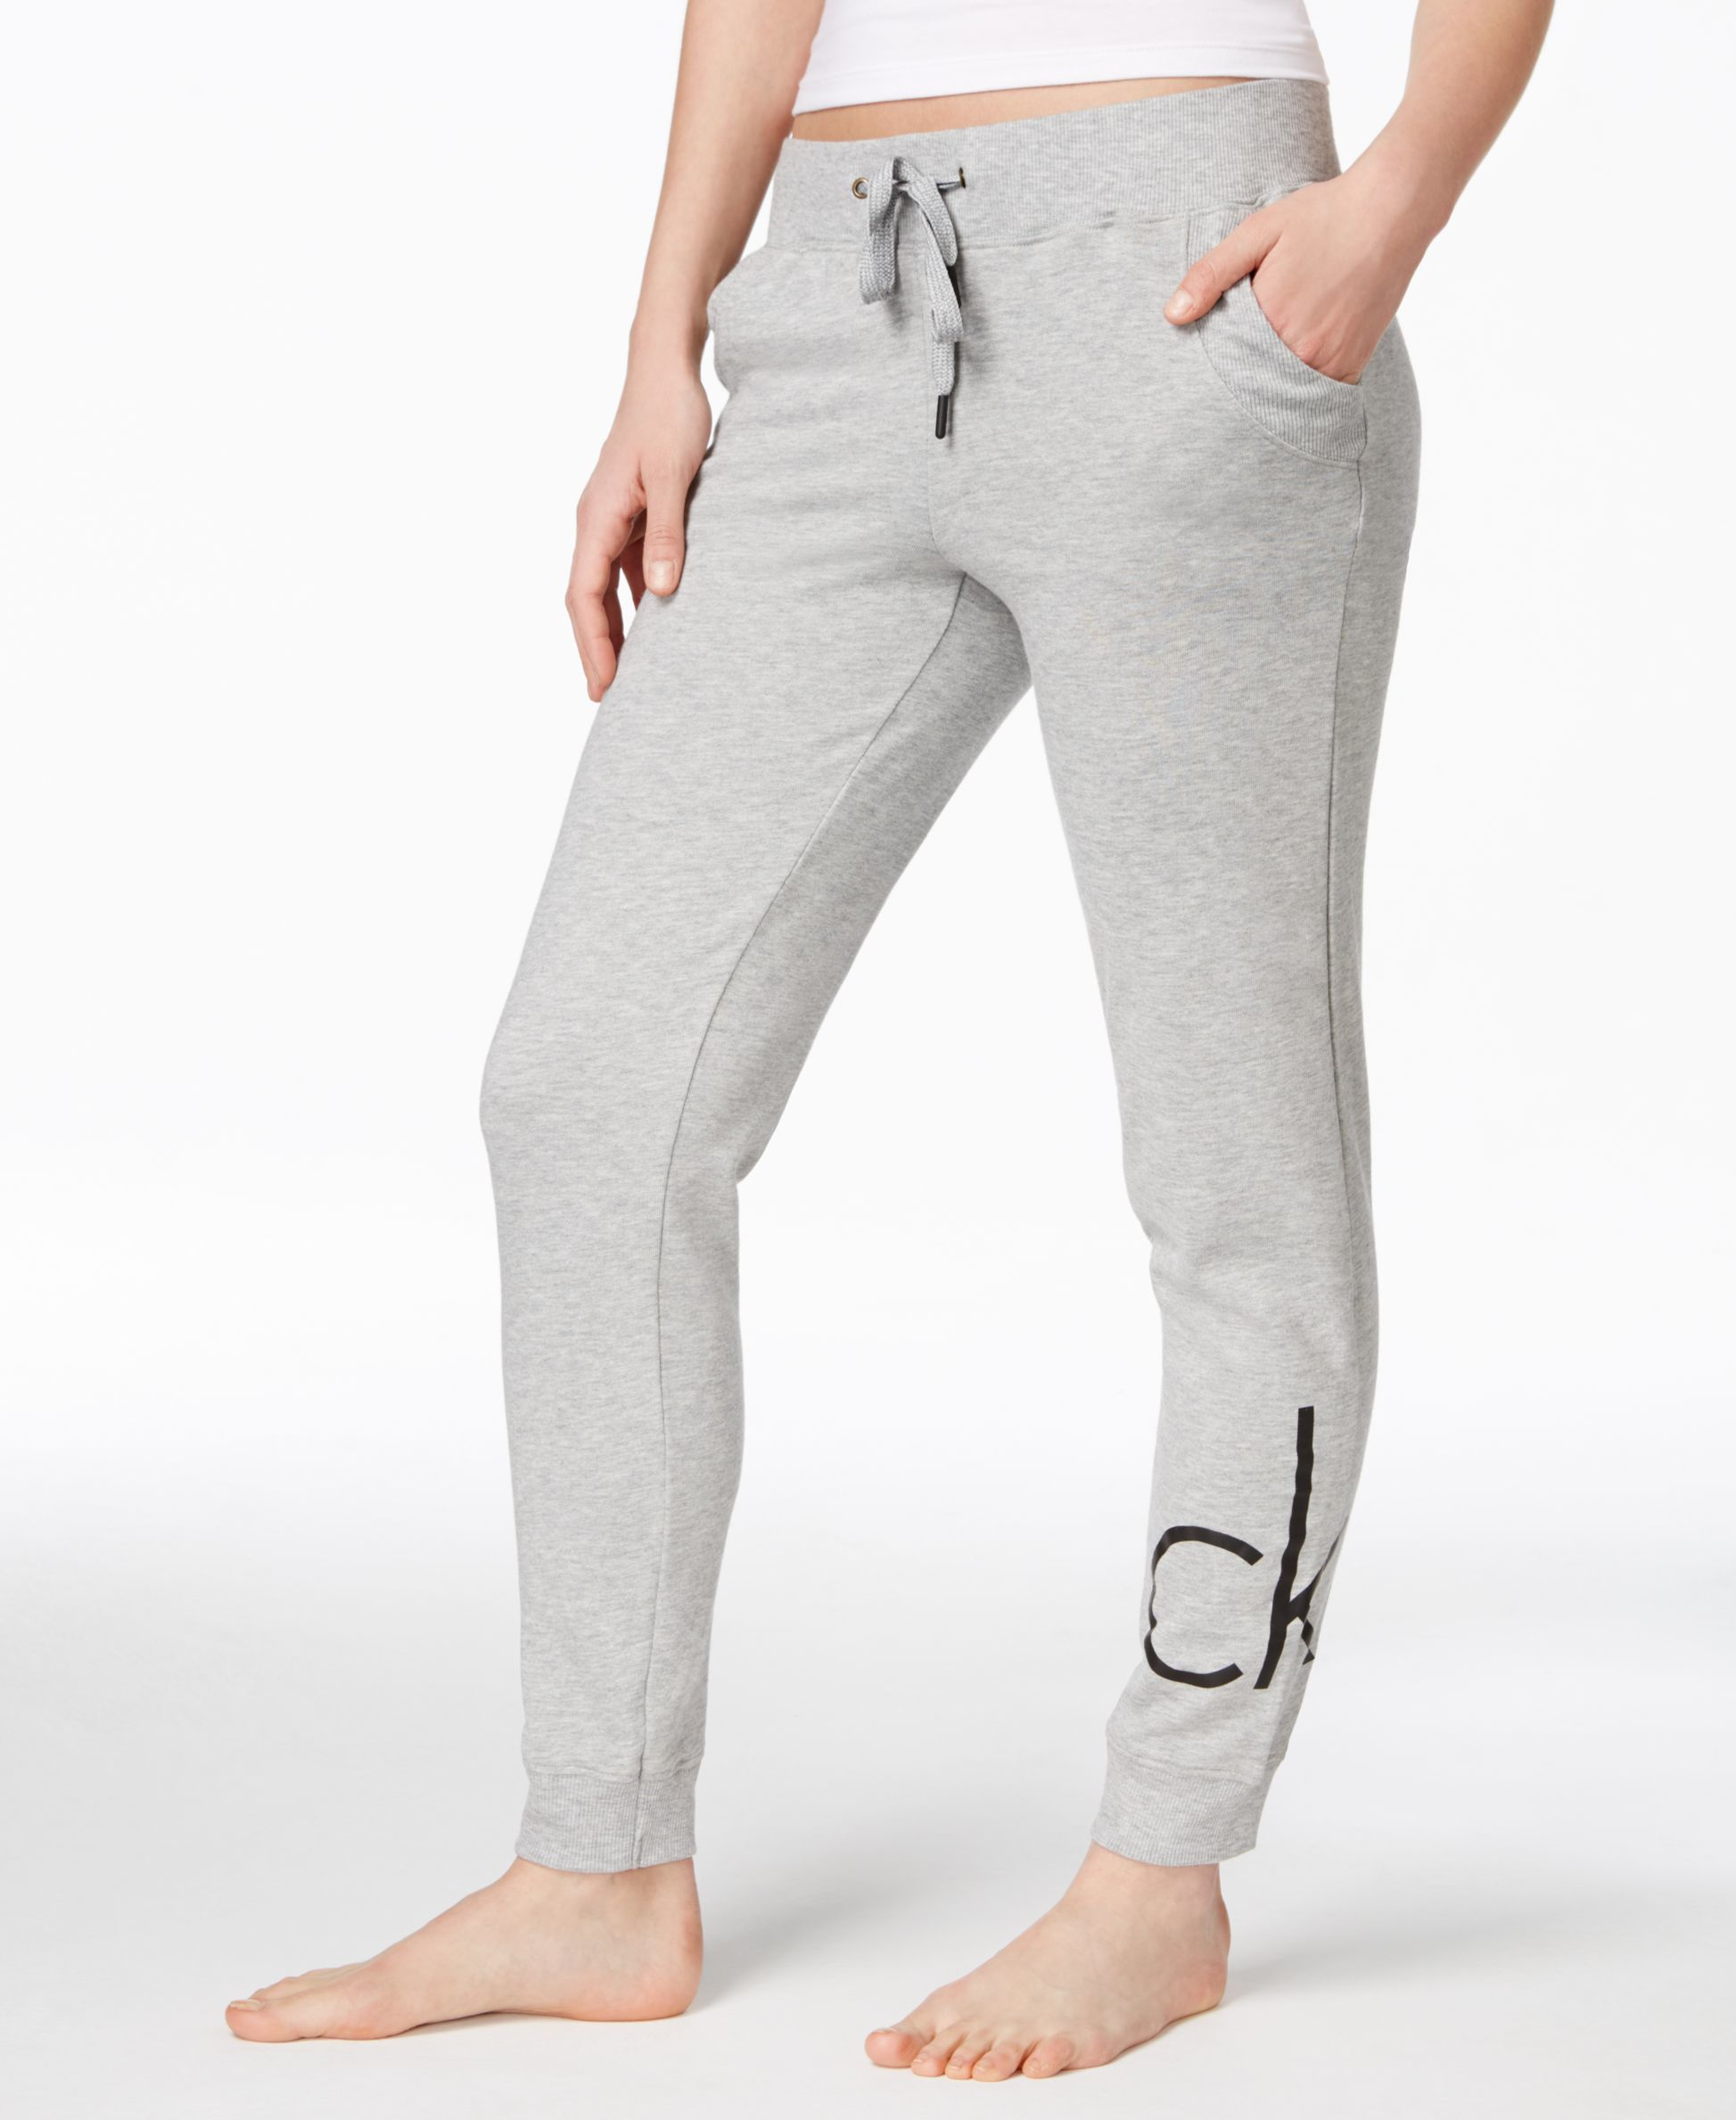 d0854c562f946 Calvin Klein Logo Jogger Pants in Gray - Lyst